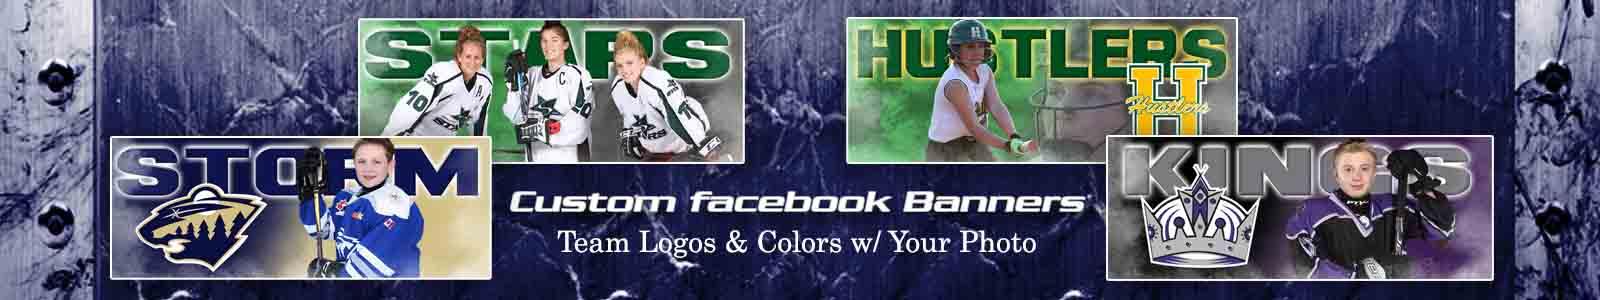 5 Face Book Banner